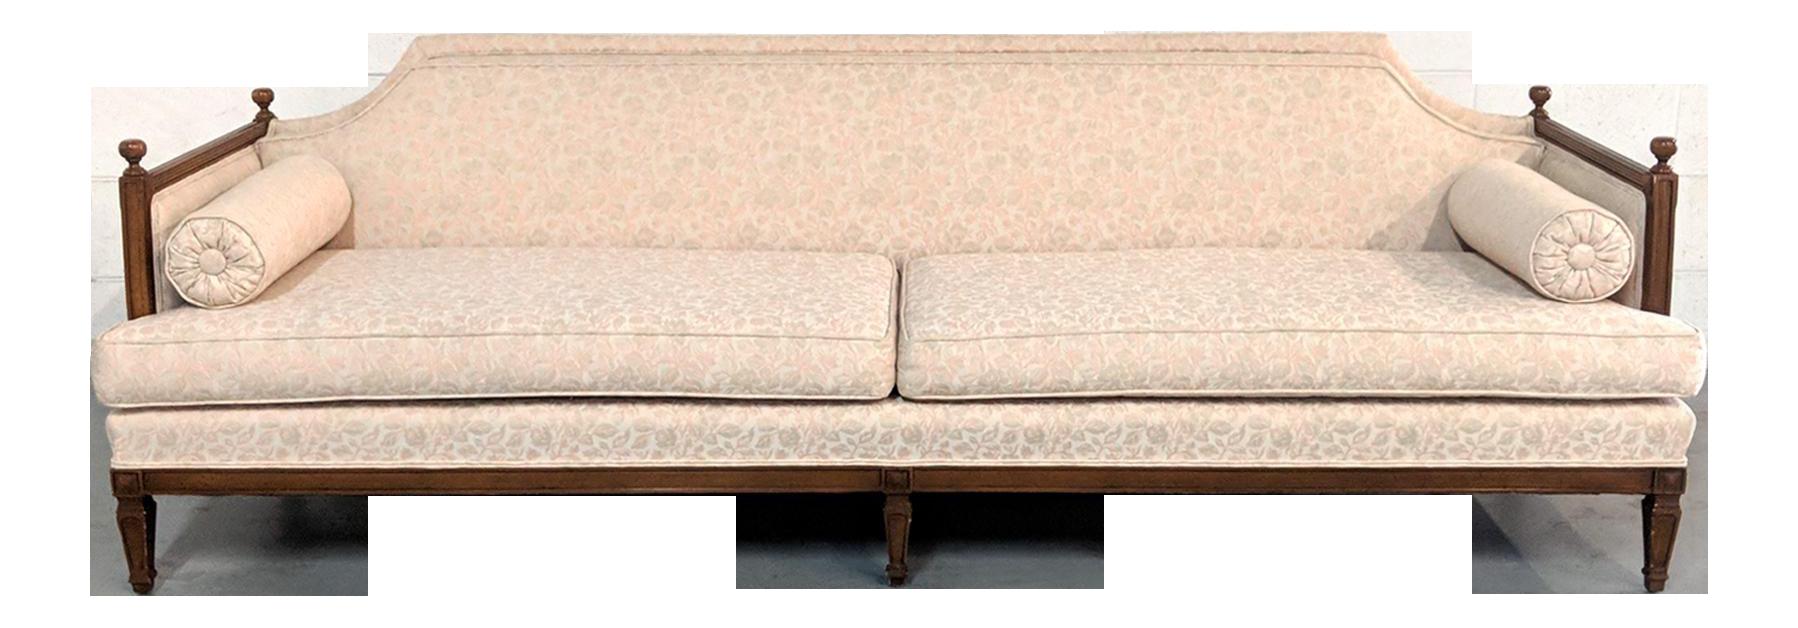 1970s French Country Pink Brocade Walnut Trim Sofa